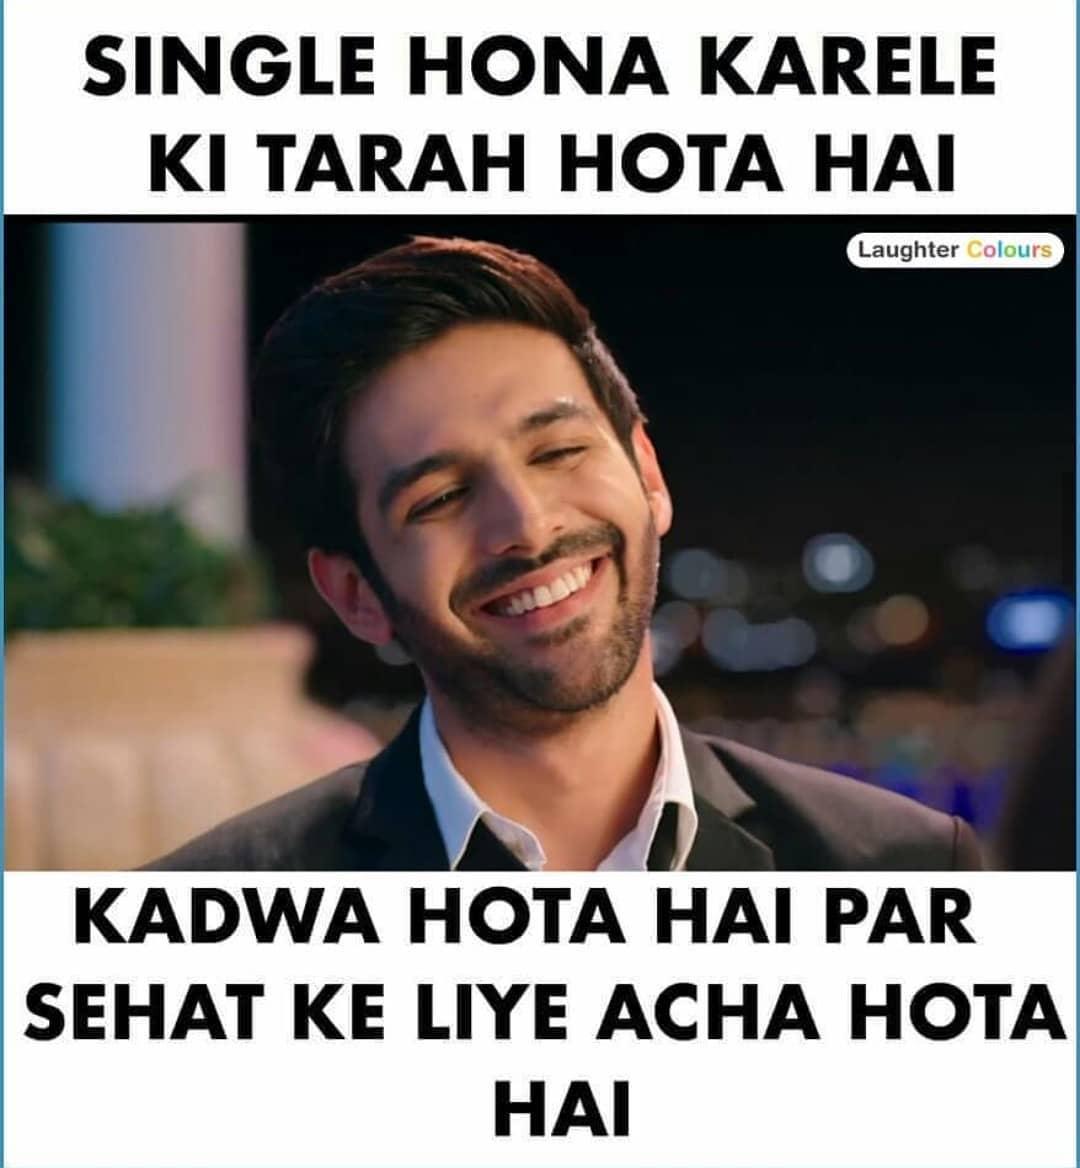 www-funny-memes-in-hindi-com-879-Dubal2-BMining2-BMemes2-B252812529